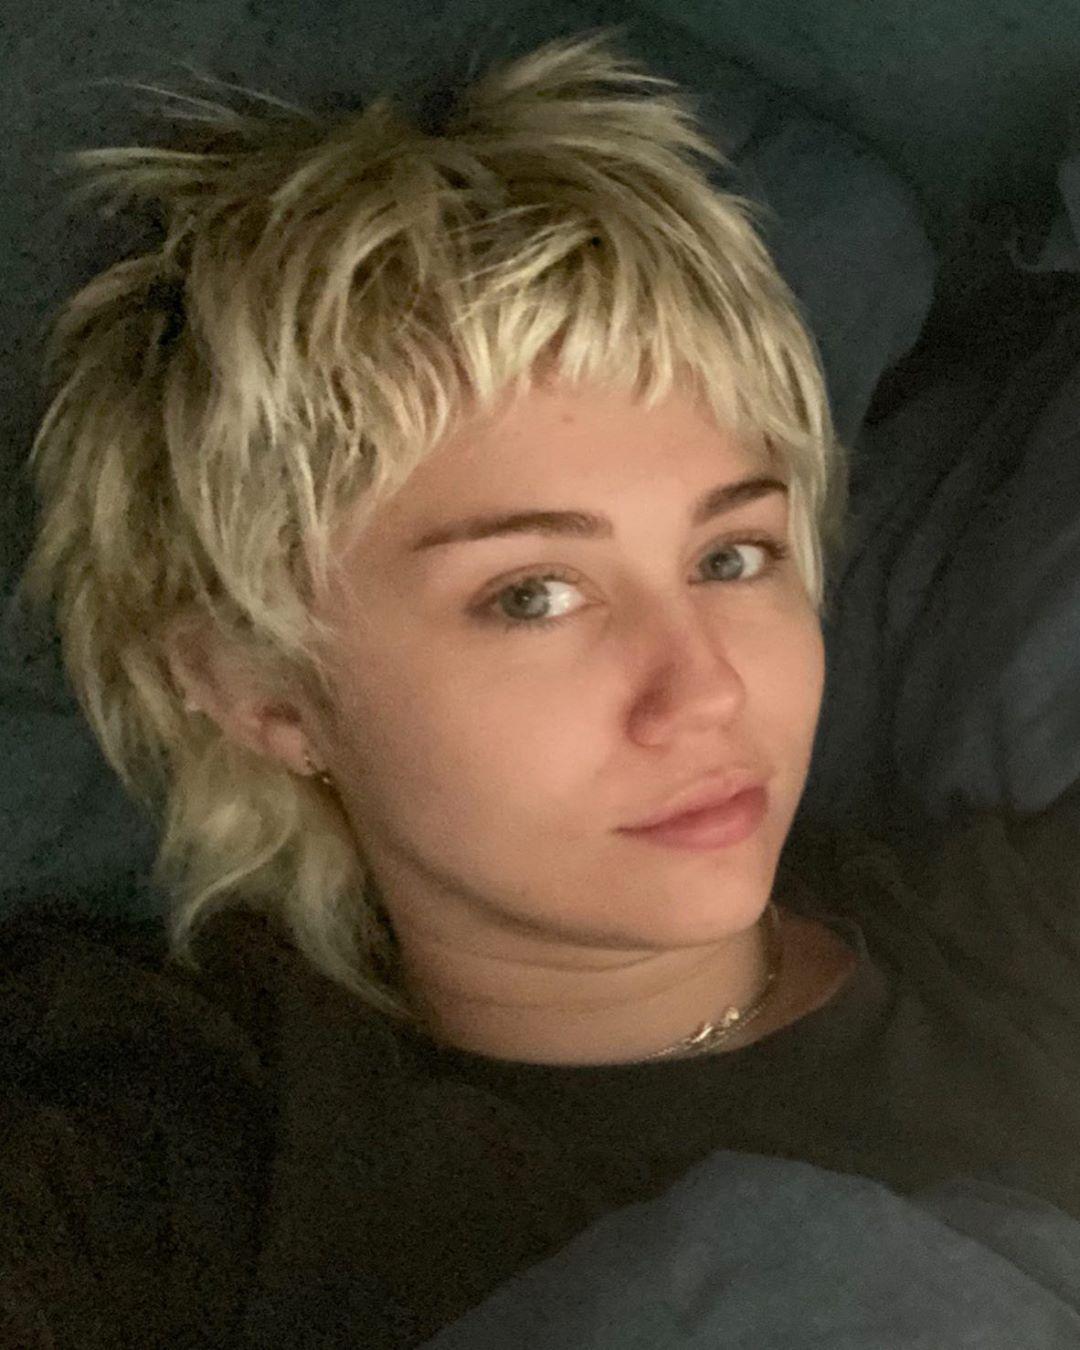 Miley Cyrus, Hair